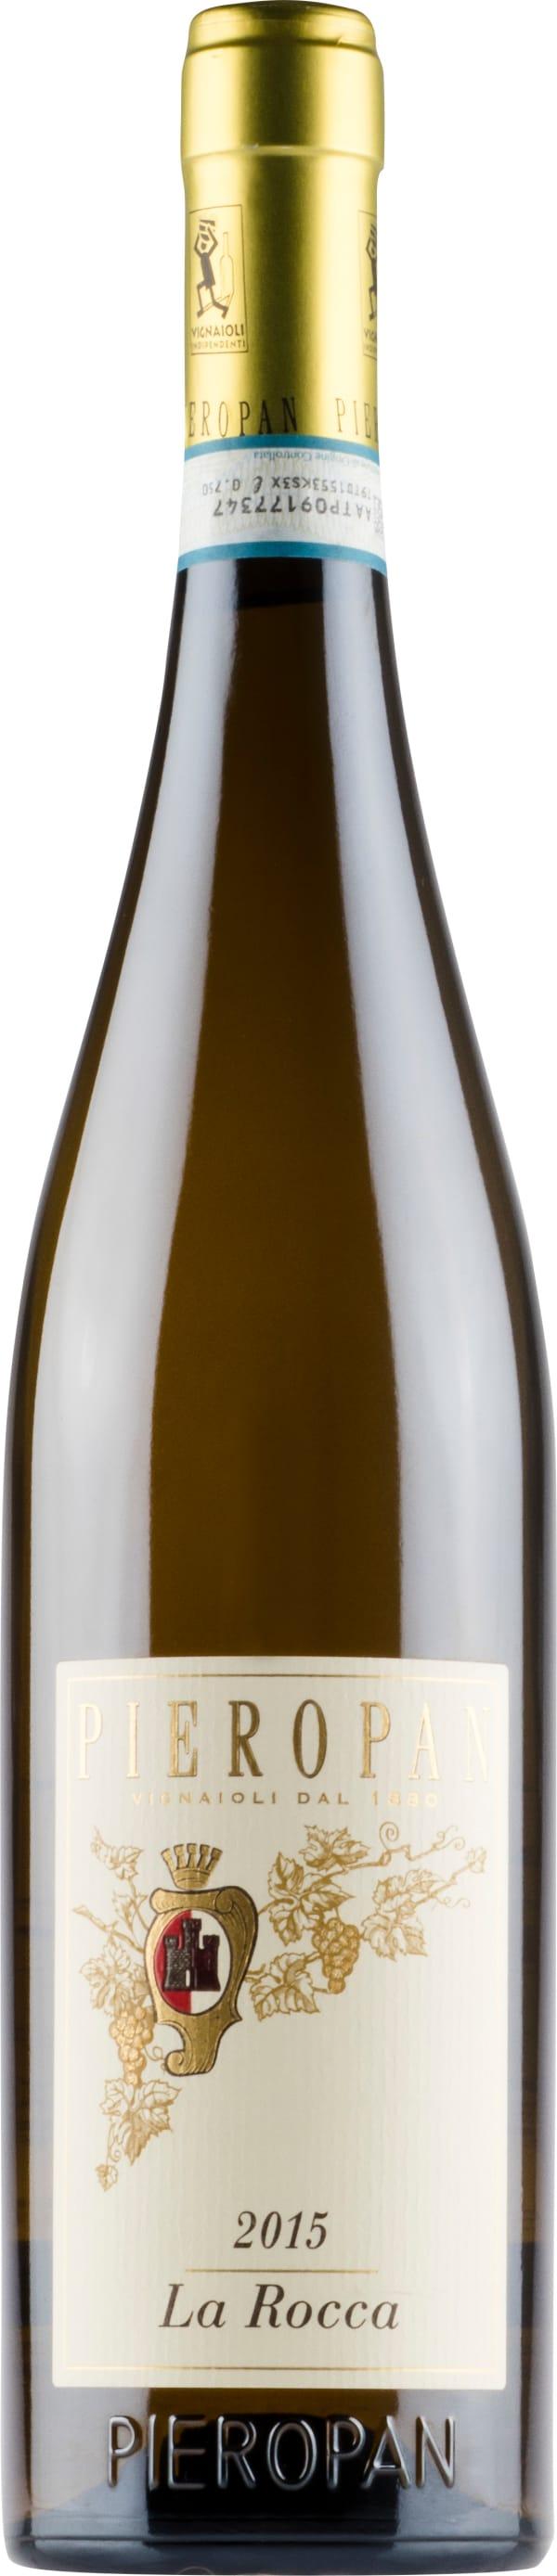 Pieropan La Rocca 2015